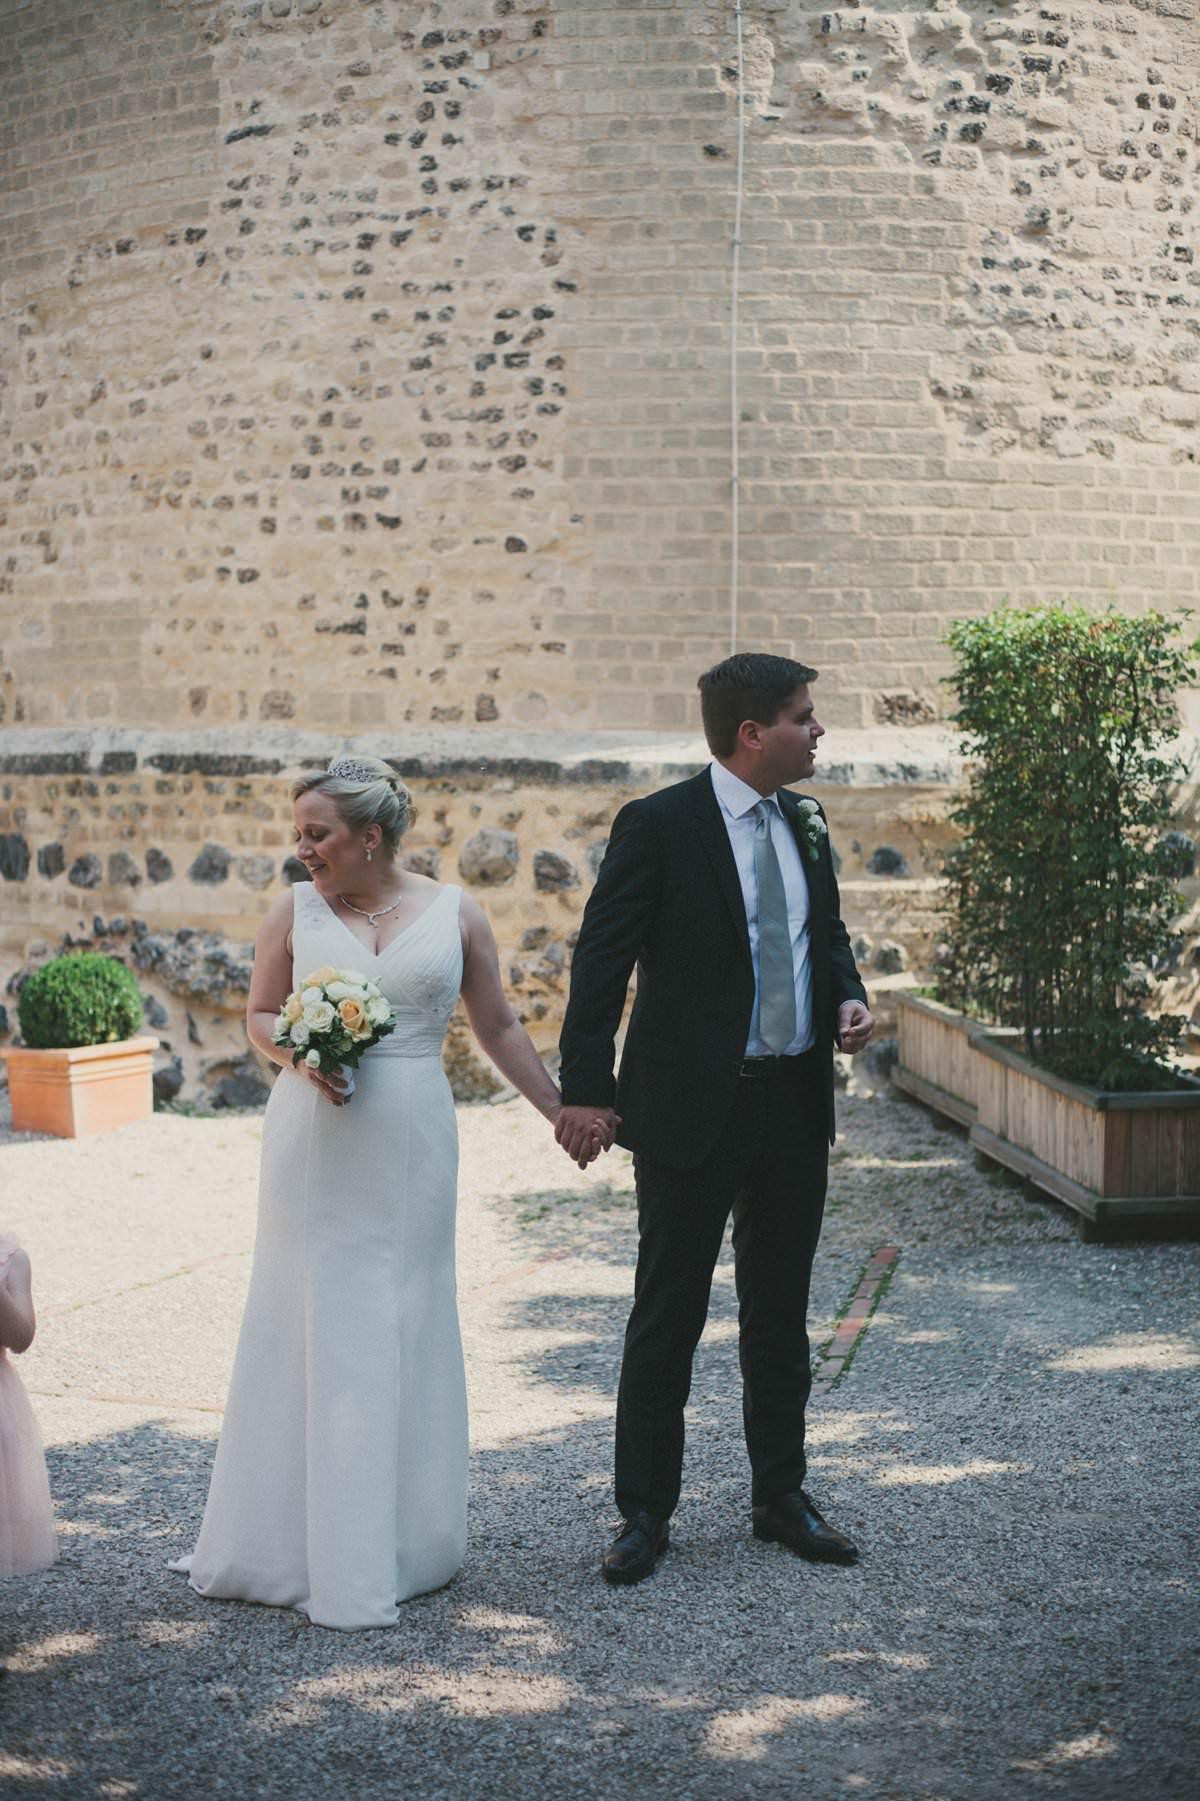 fine-art-destination-wedding-photography-bonn-germany-032